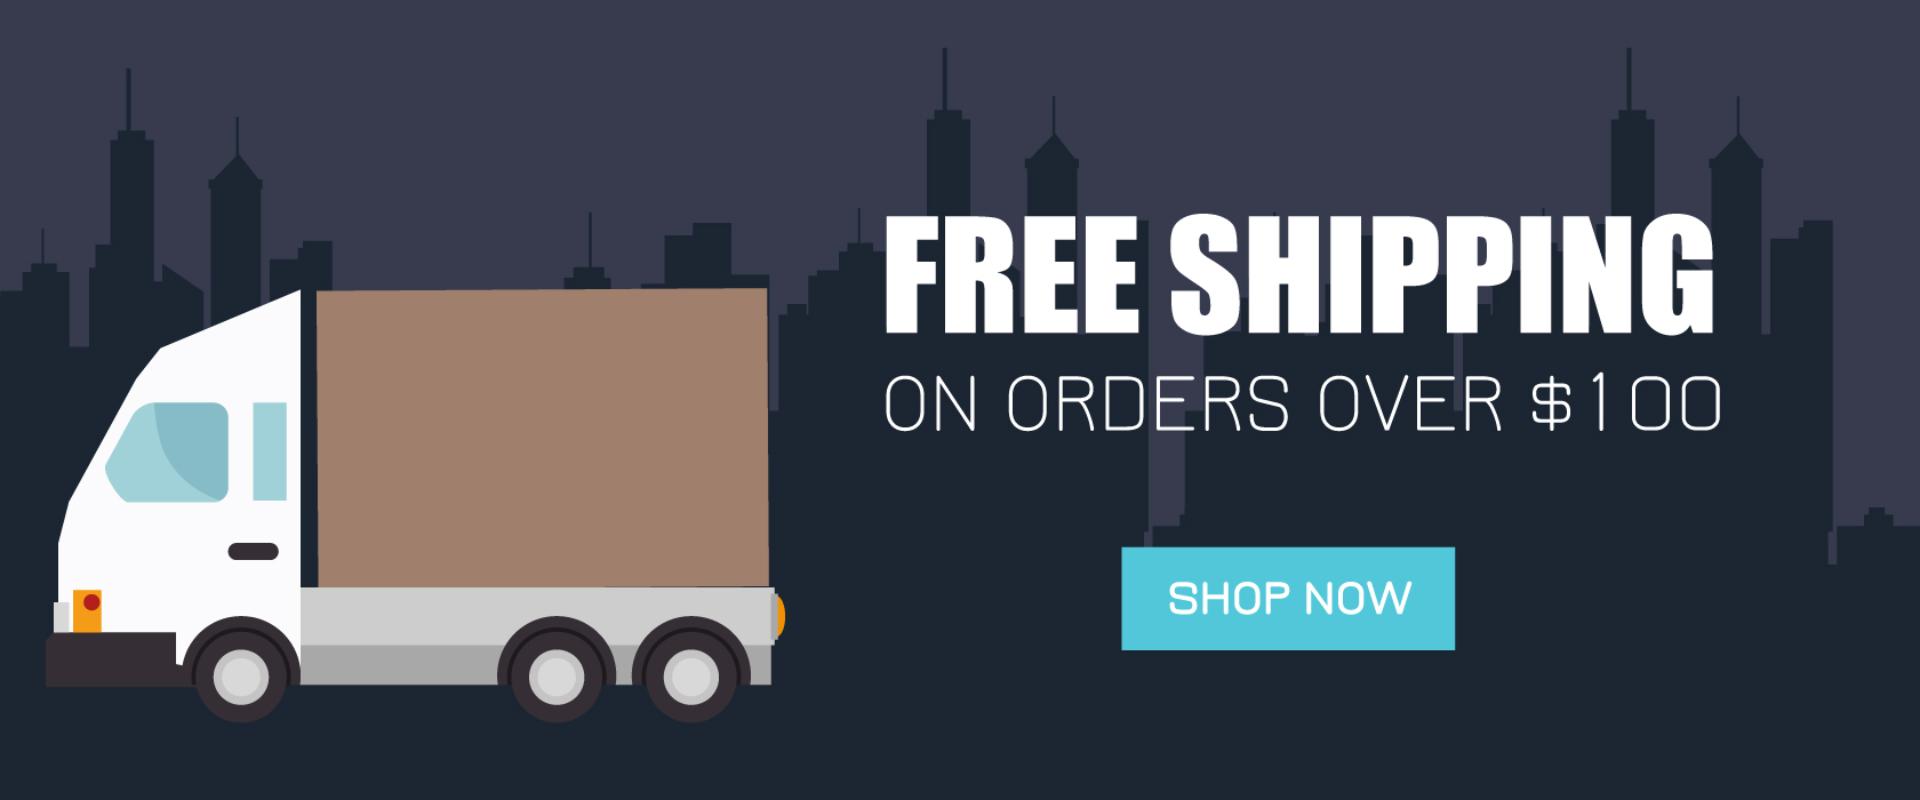 free-shipping-nz-fabric